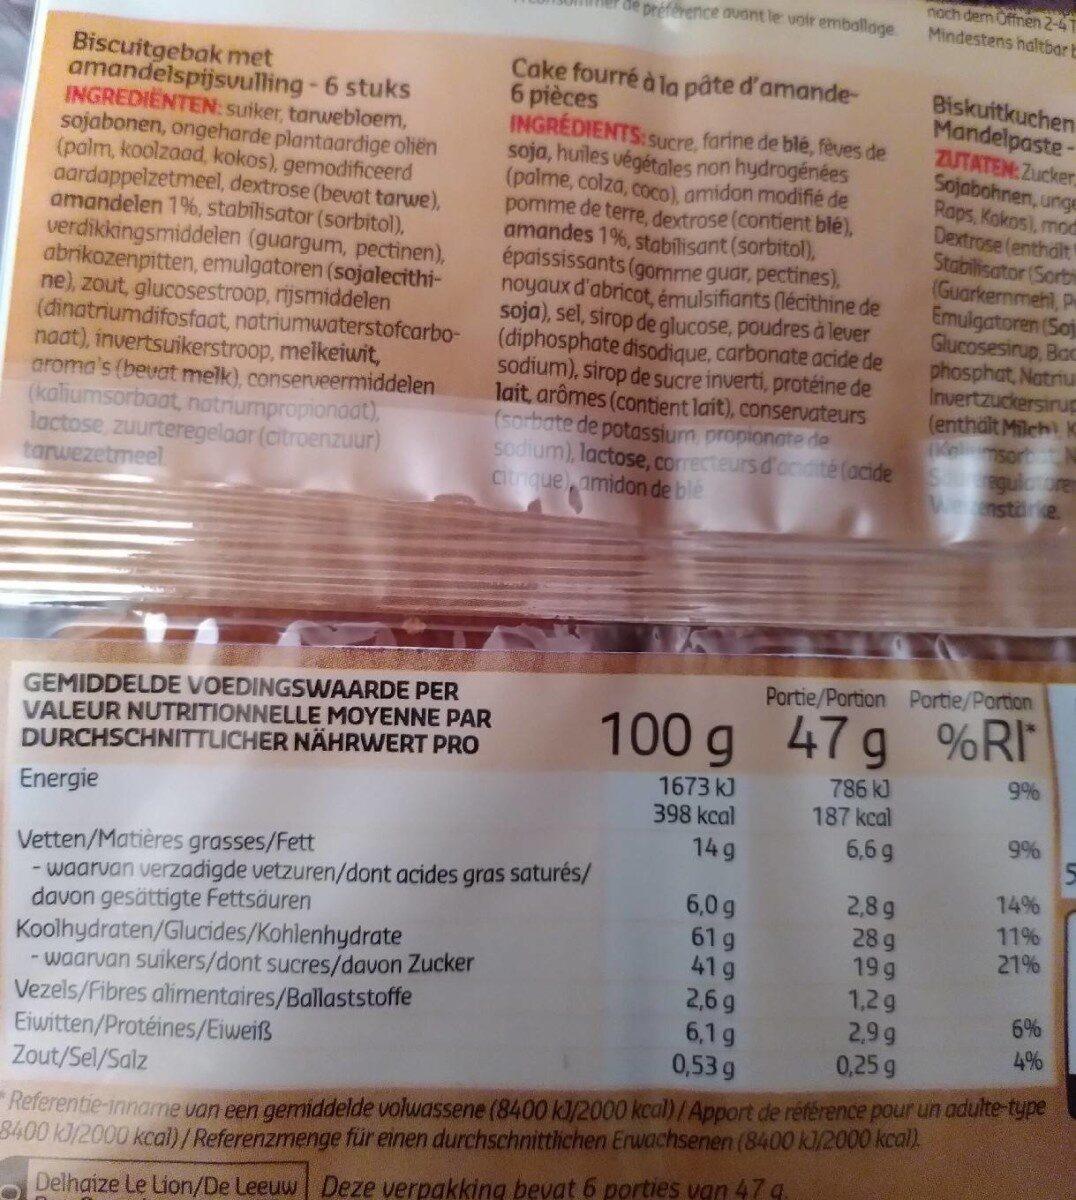 Carrés au goût frangipane - Informazioni nutrizionali - fr